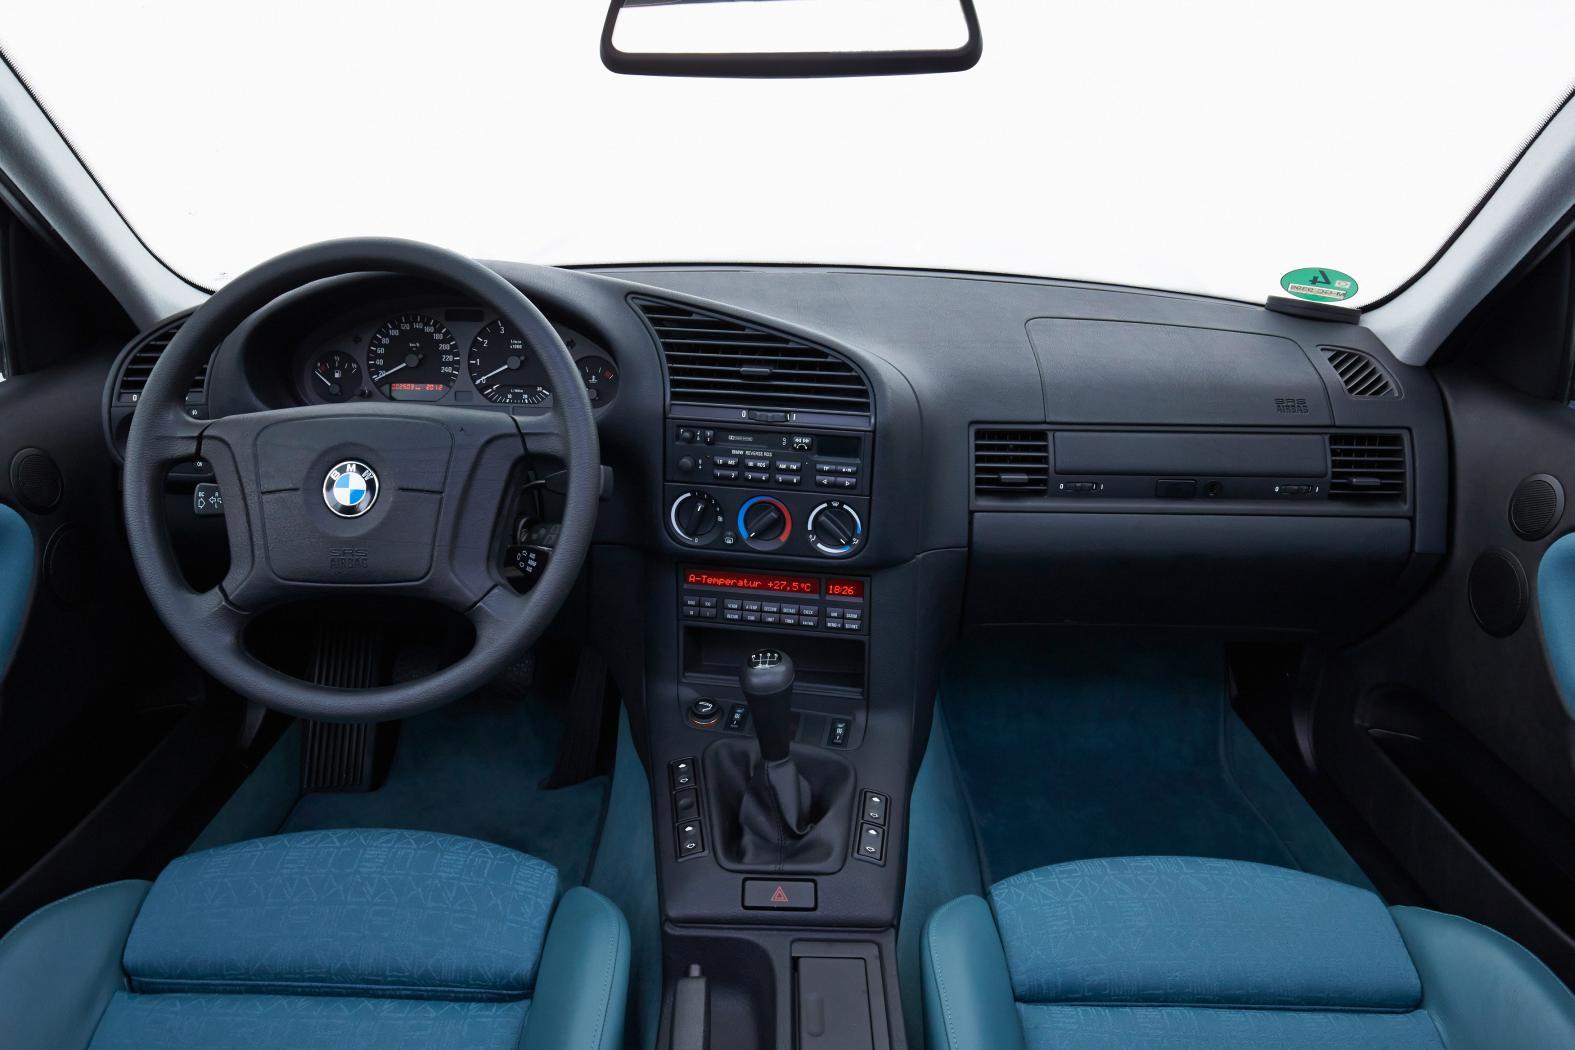 Poste-de-conduite-Serie-3-E36.jpeg